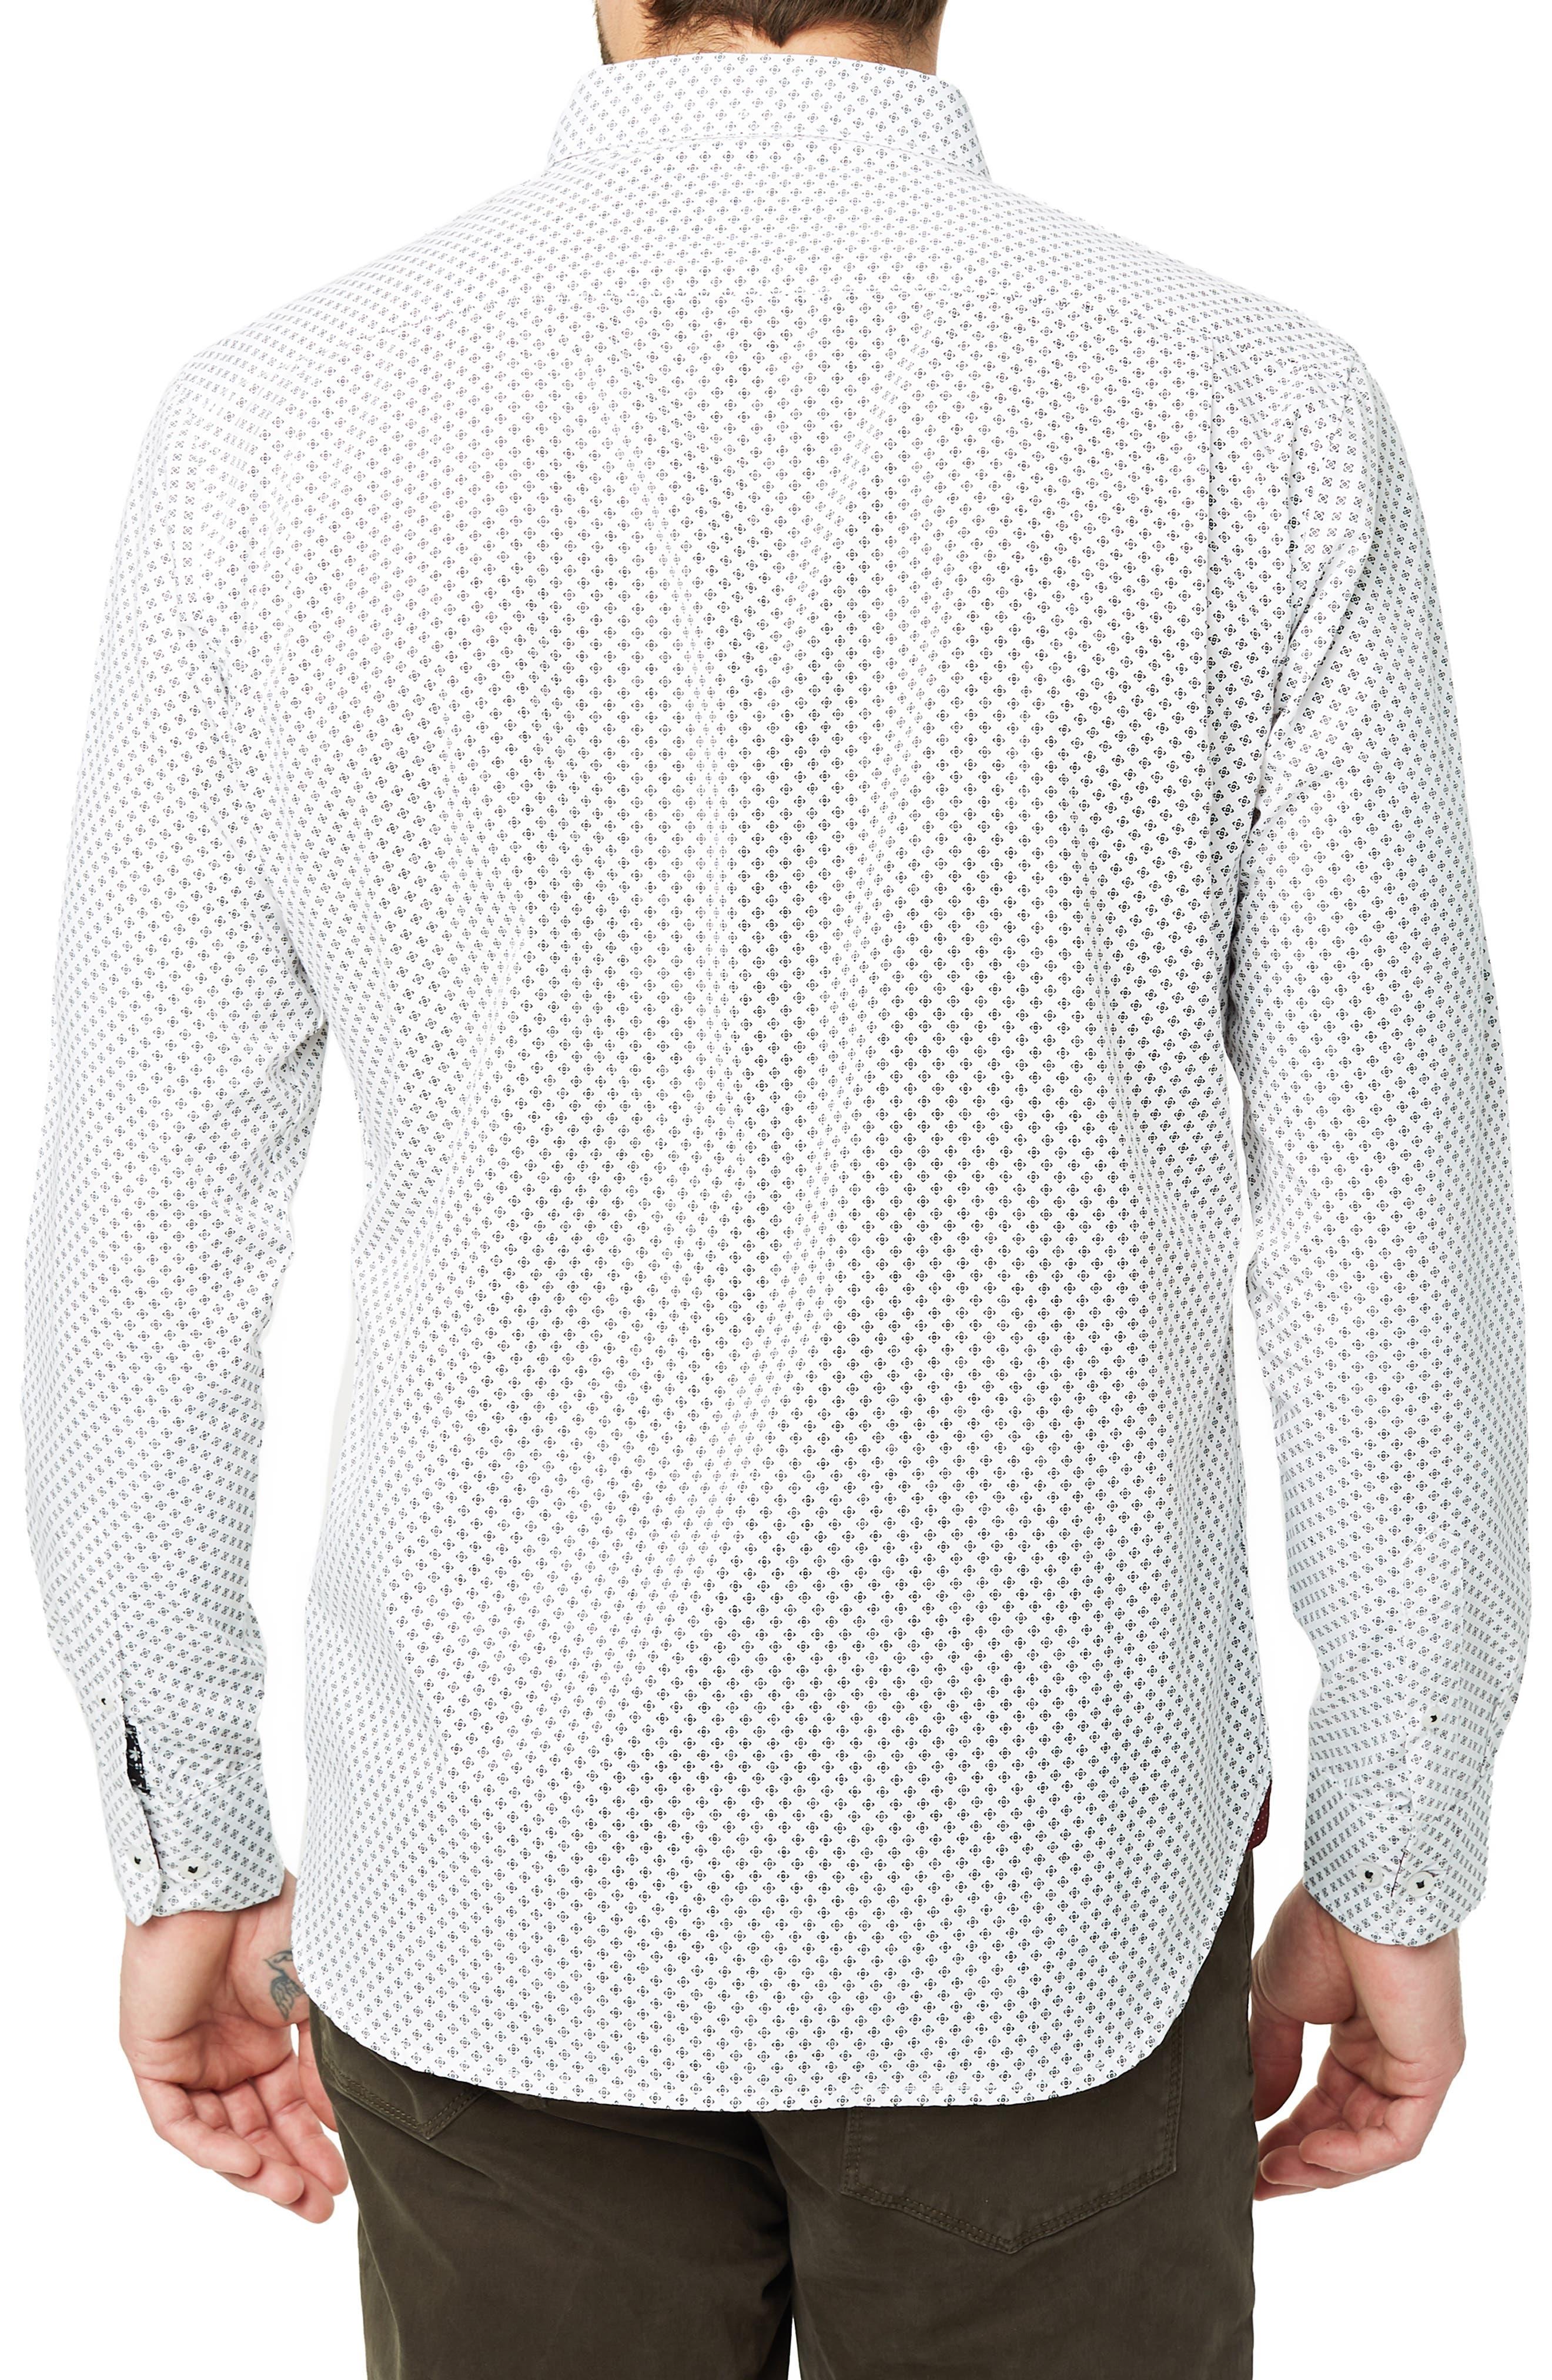 Radio Mix Slim Fit Sport Shirt,                             Alternate thumbnail 3, color,                             WHITE